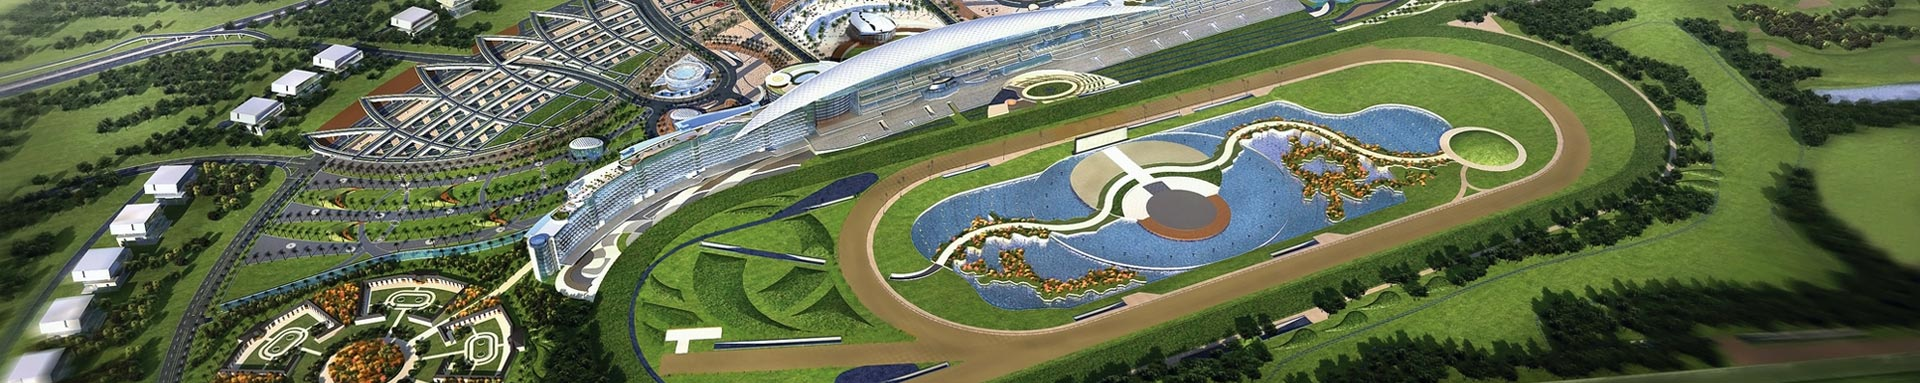 Meydan City Off Plan Properties in Dubai